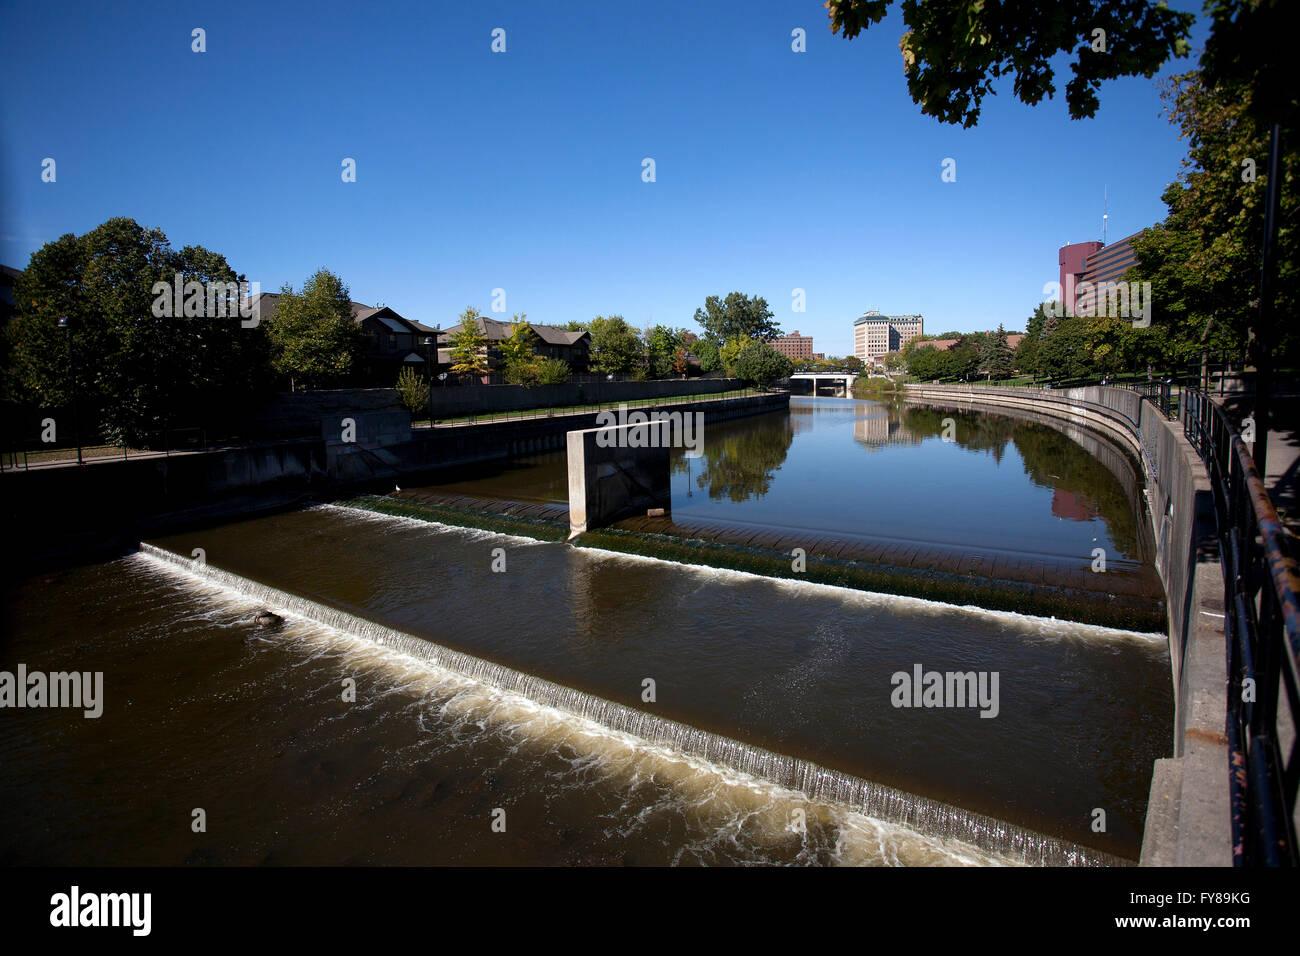 Flint River in Flint, Michigan. - Stock Image